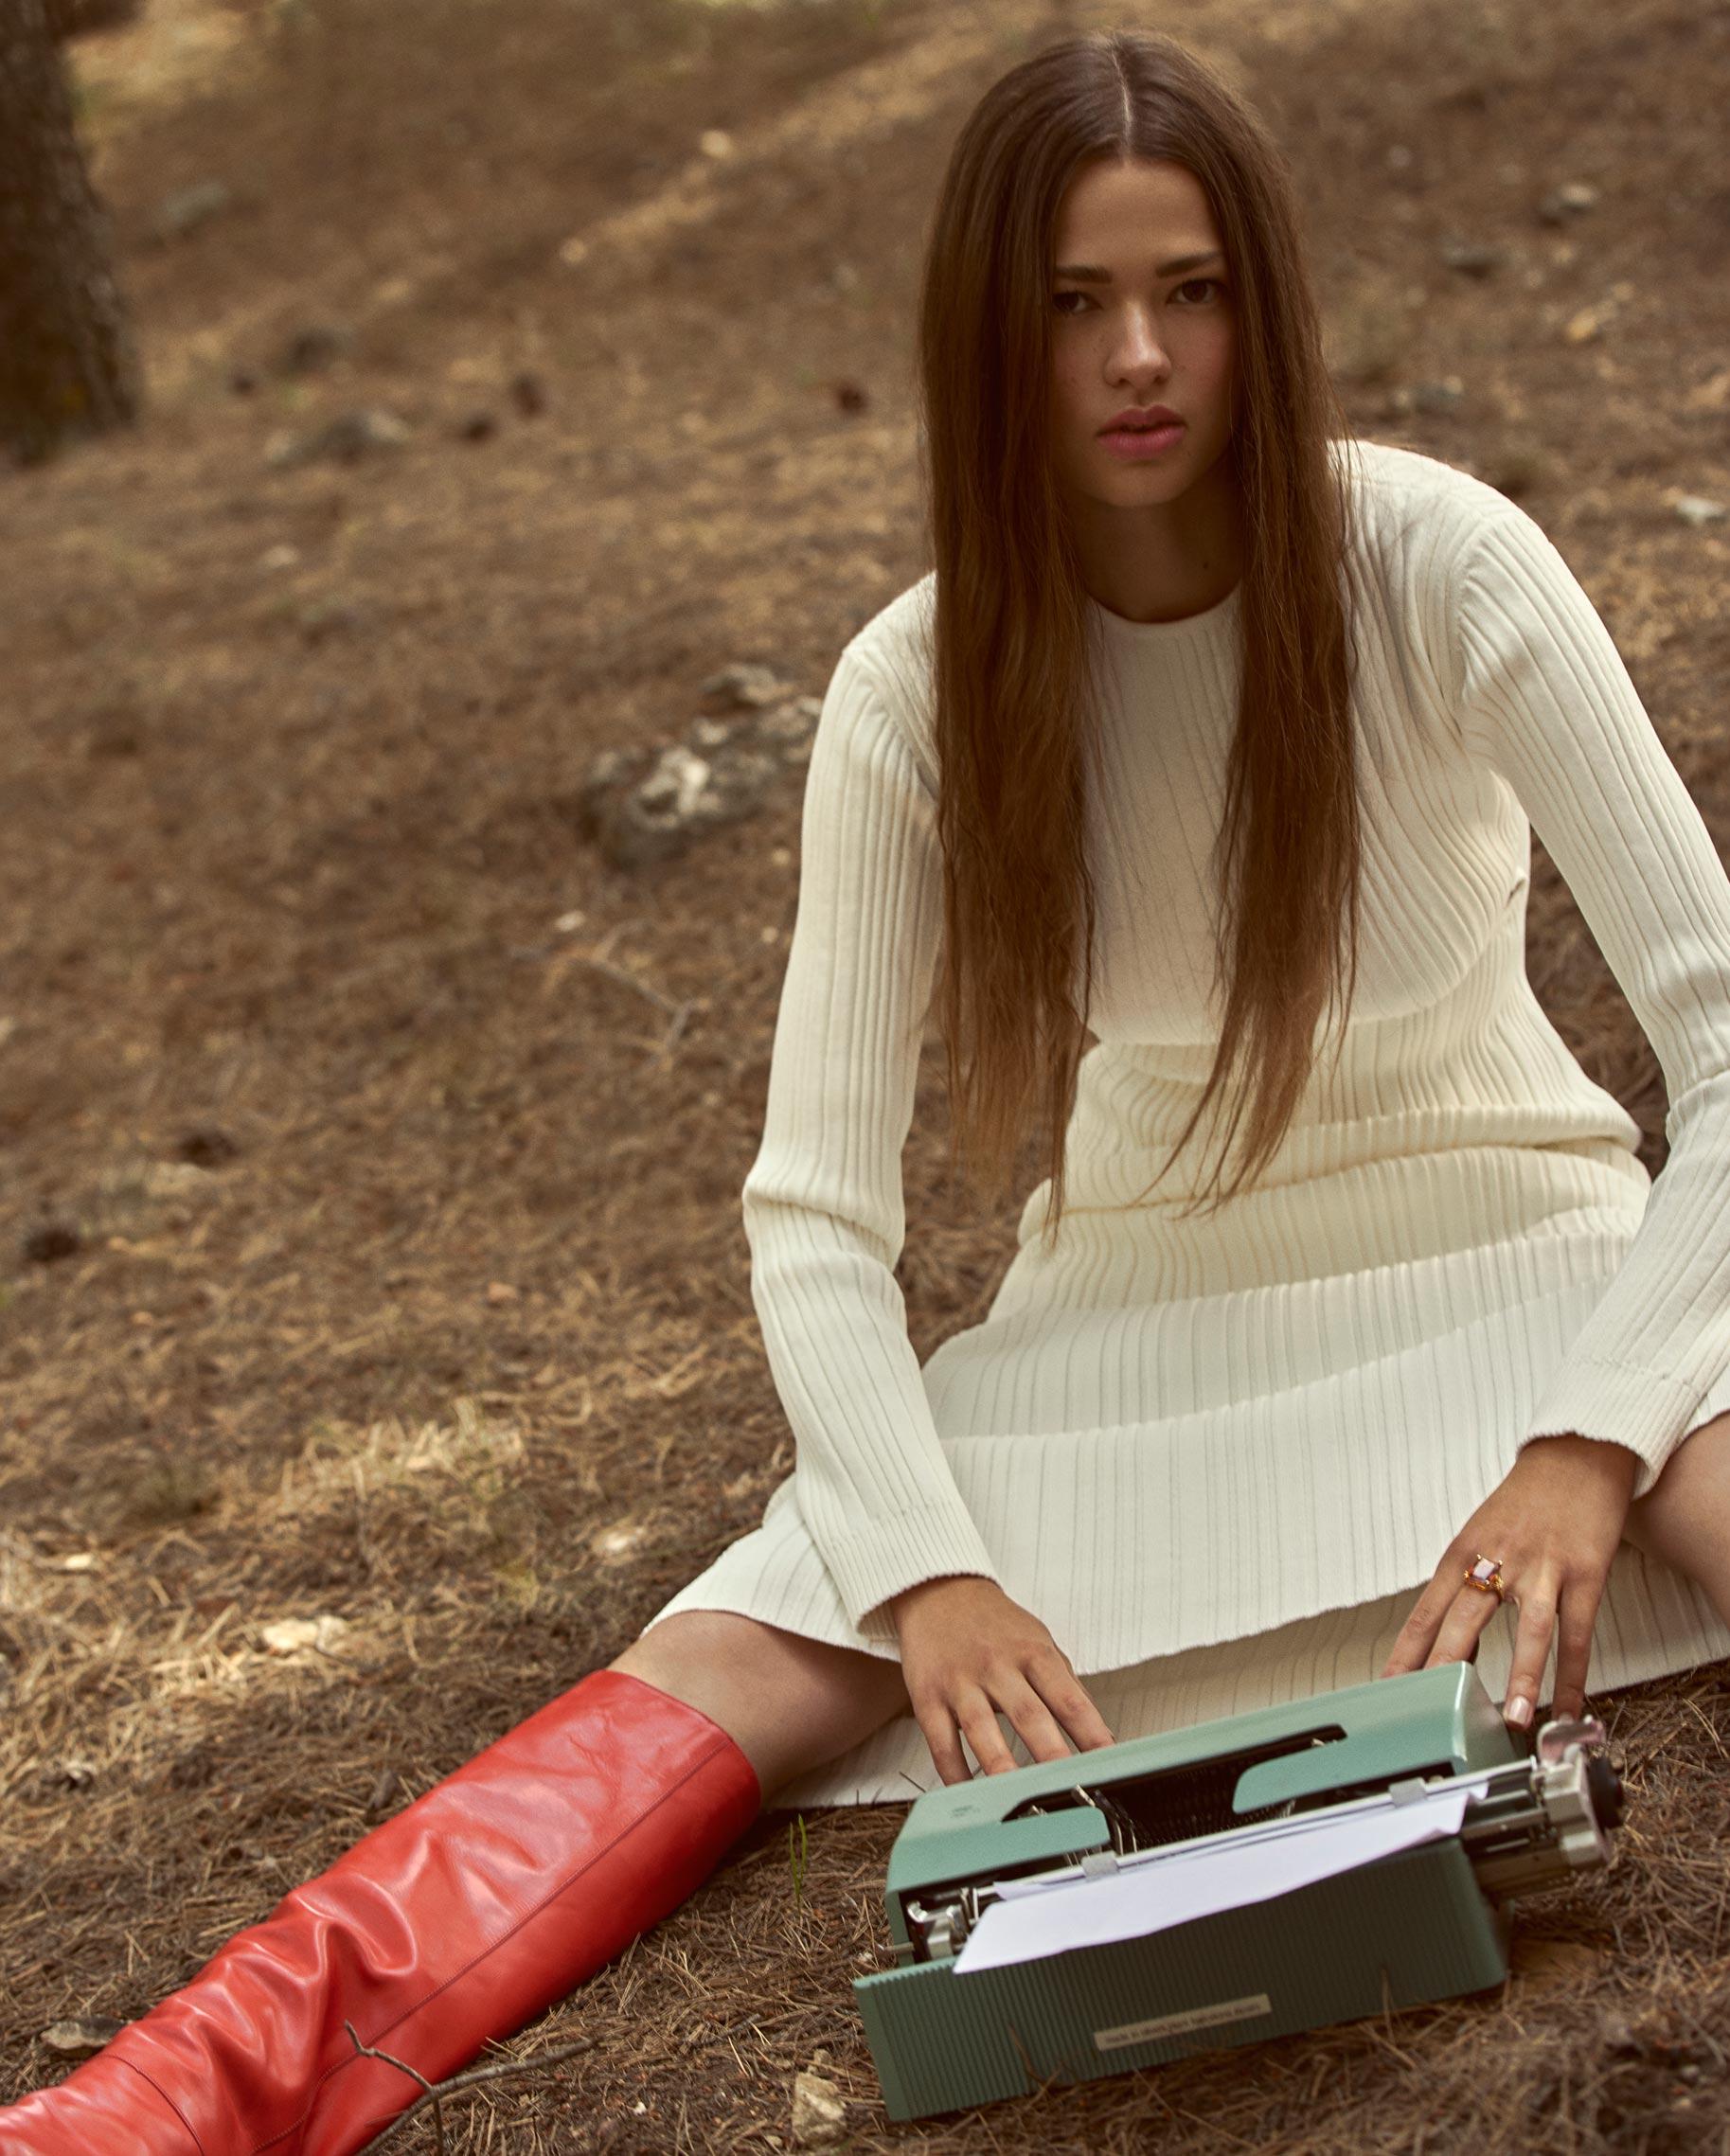 Диана Свиридова в лесу демонстрирует винтажную технику и новинки моды / фото 07